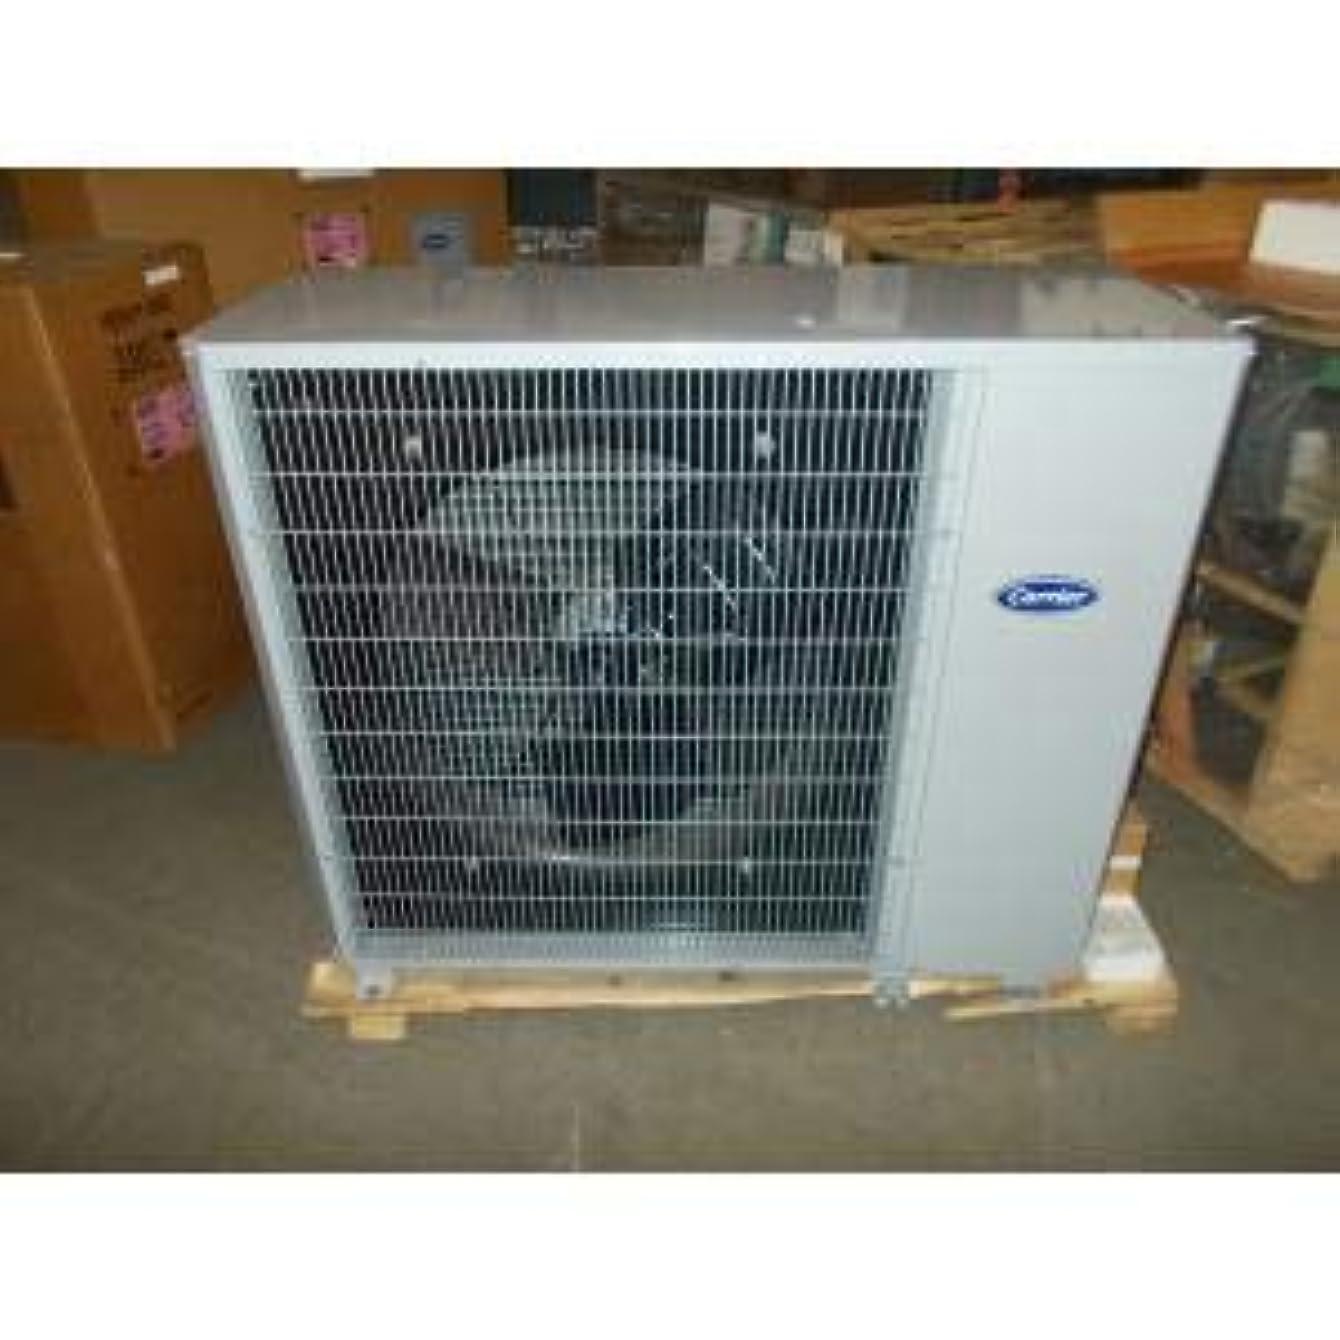 Performance Carrier 38QRF035-6 3 TON Series Outdoor Mini-Split Heat Pump AIR Conditioner, 13 SEER 460/60/3 R-410A CFM 910